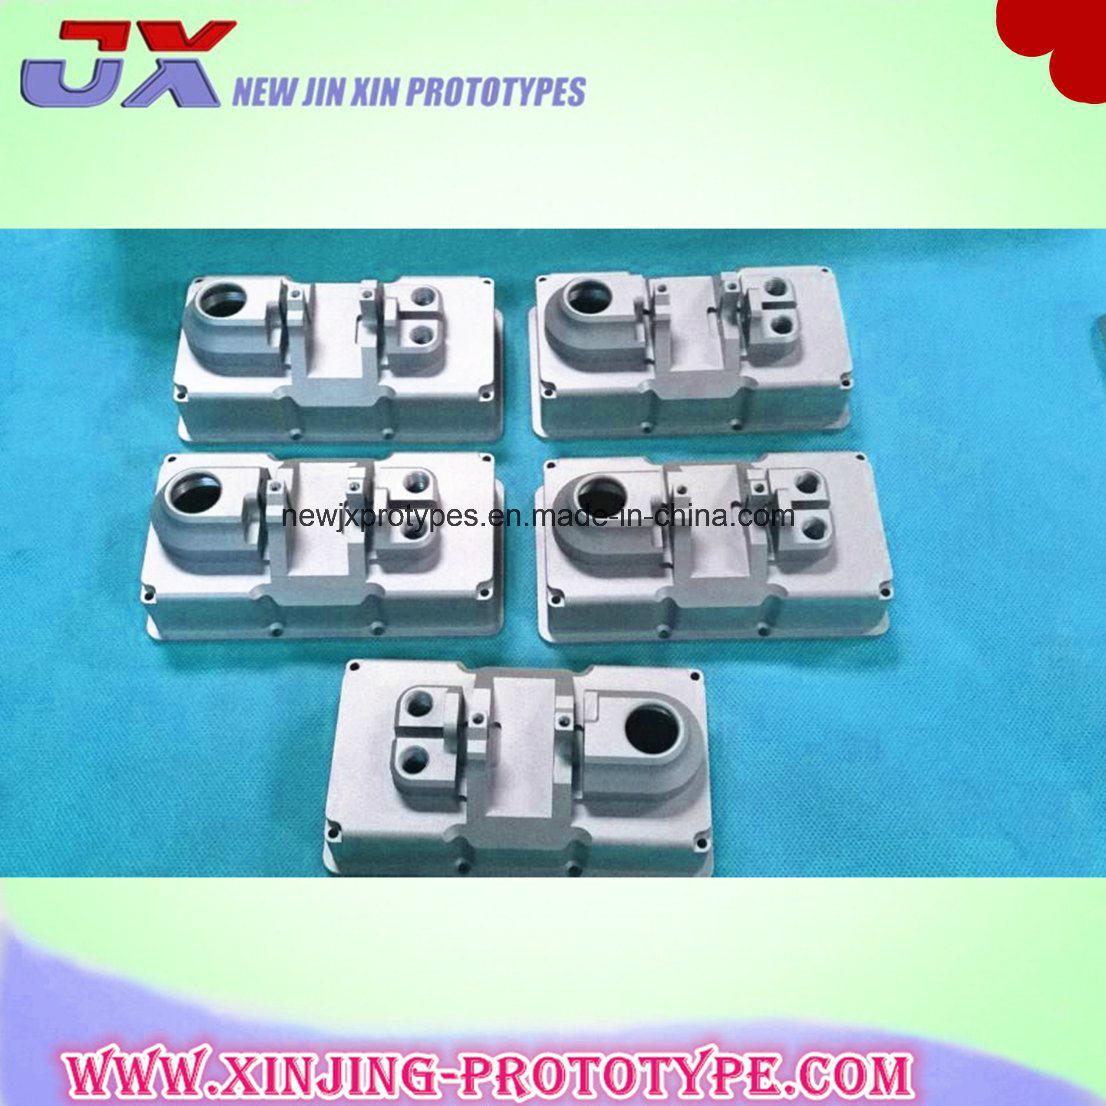 Customized CNC Precision Aluminum Parts/CNC Milling Parts/Sheet Metal Stamping/EDM